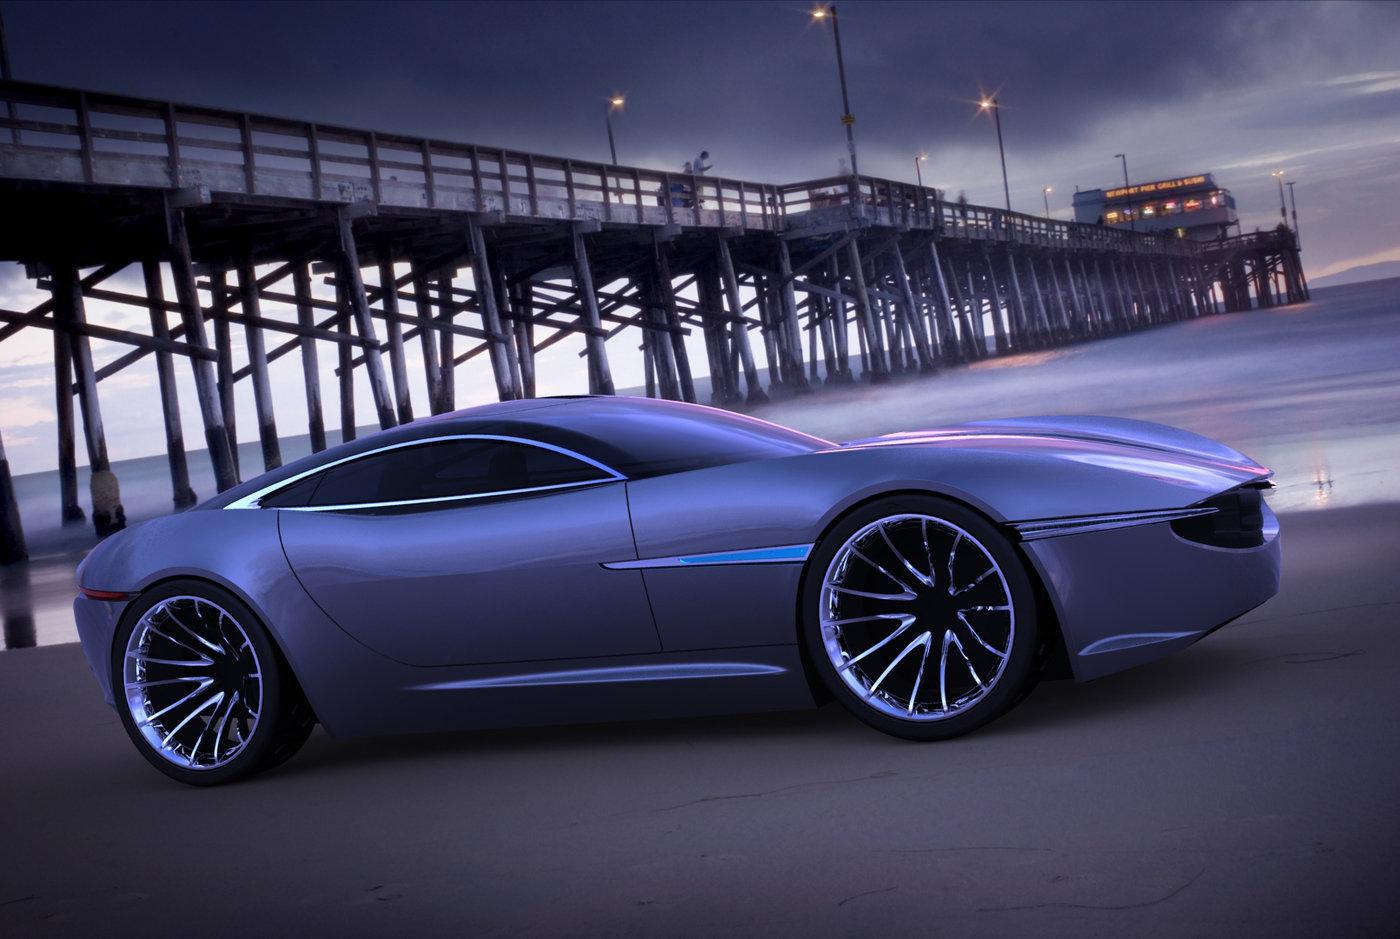 Jaguar XK Concept by Karl Sanders at Coroflot.com